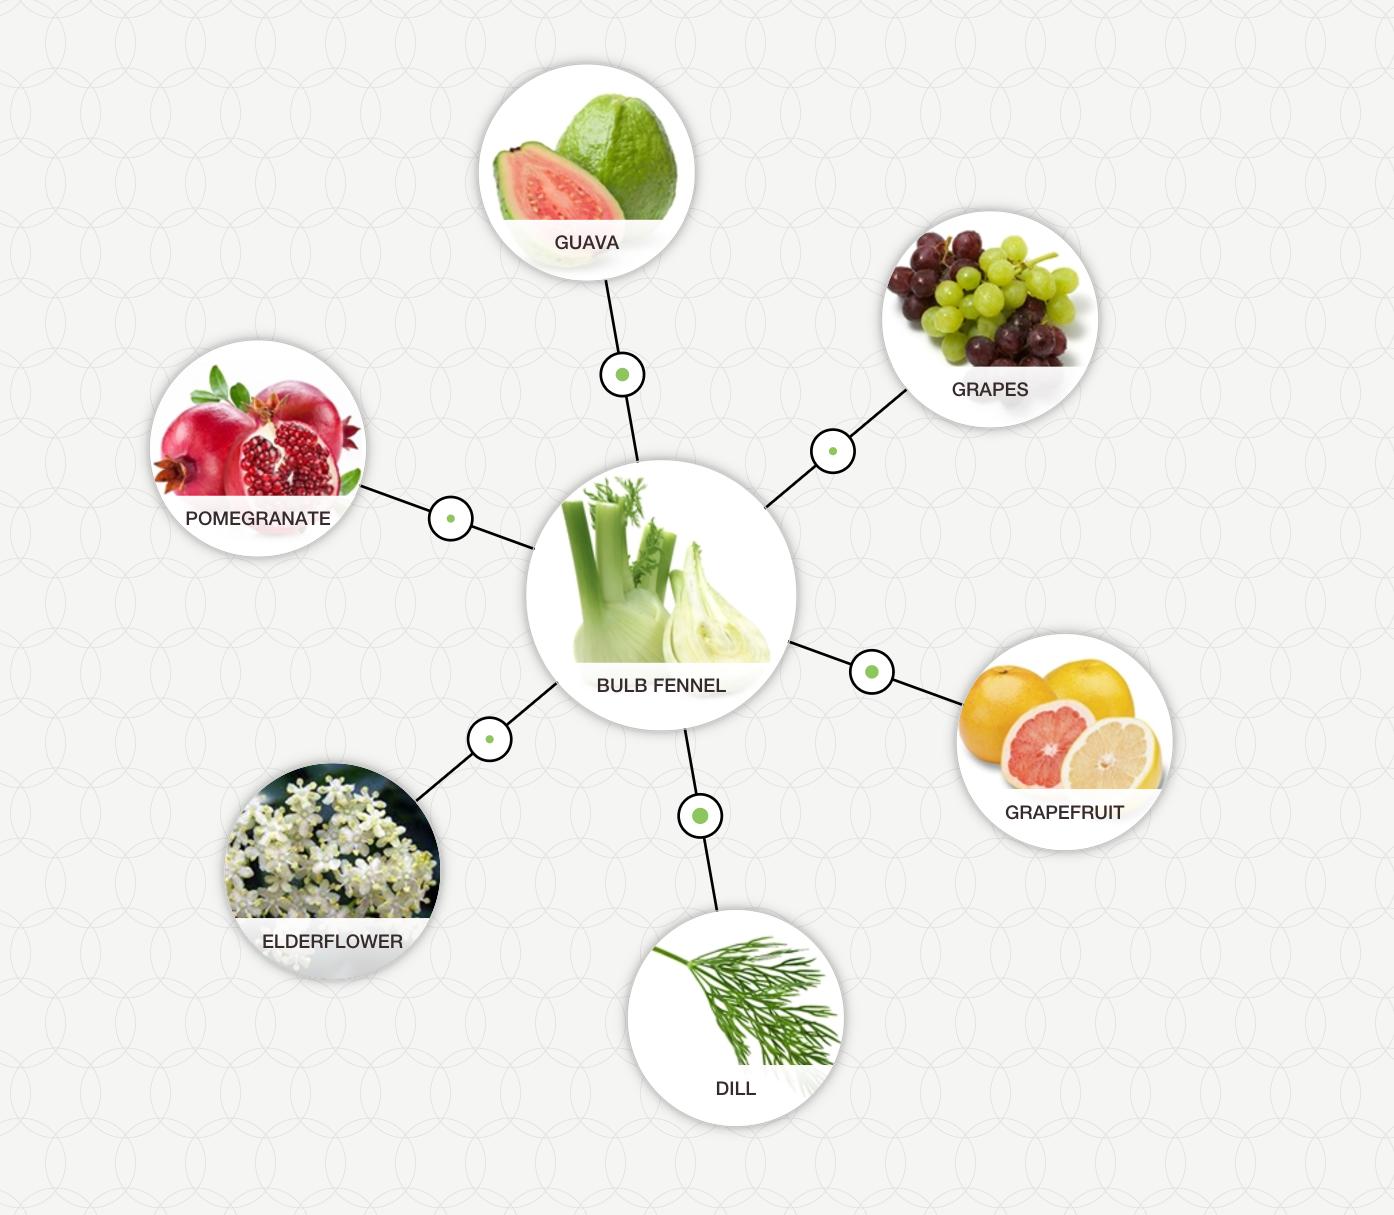 http://blog-assets.foodpairing.com/2017/05/Screen-Shot-2017-05-15-at-13.34.42.png